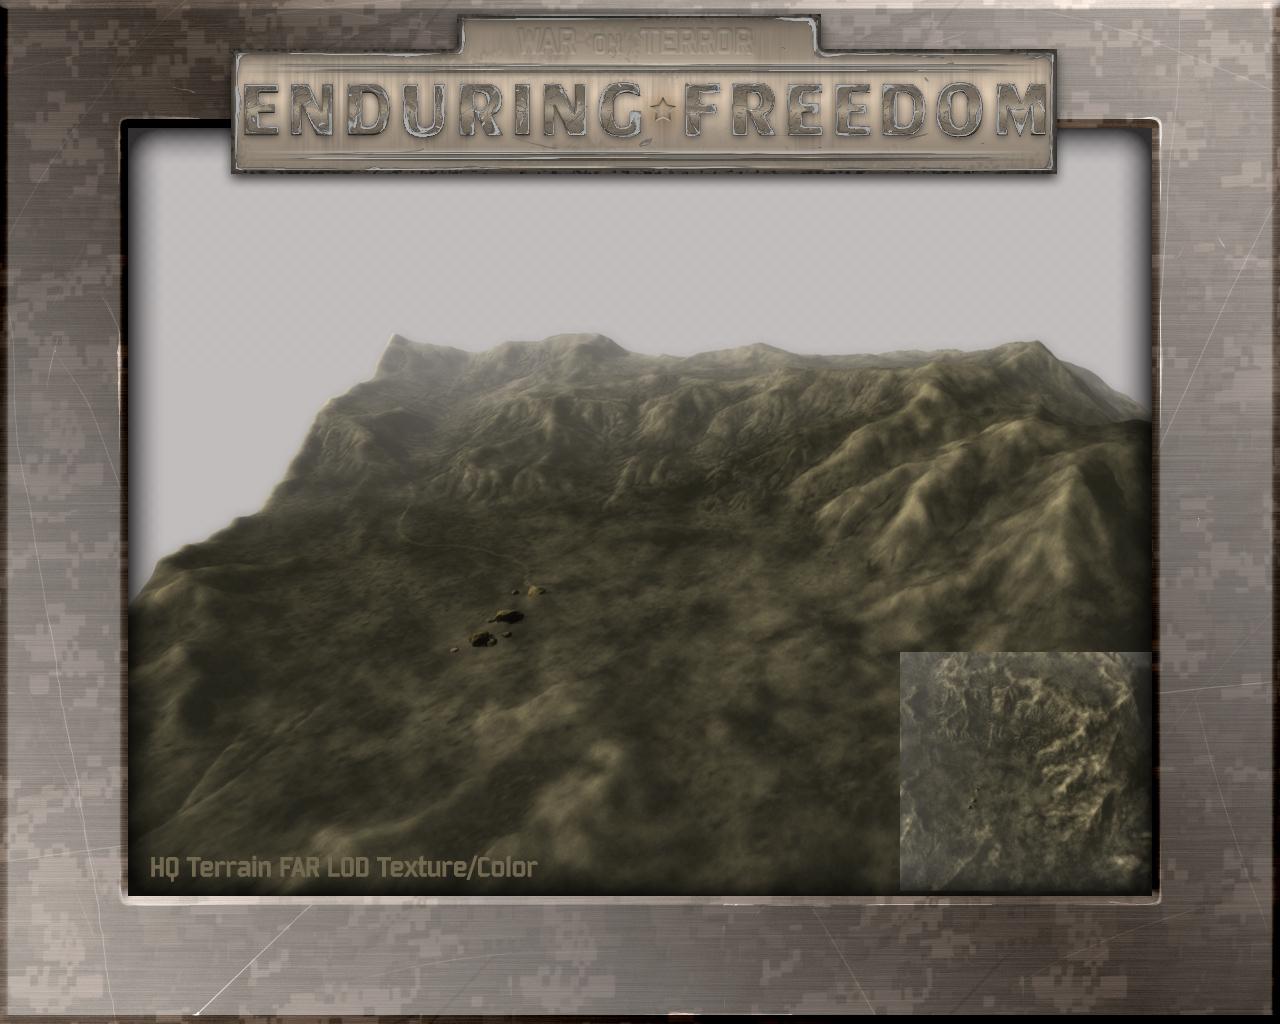 Hq Terrain Far Lod Texture Color Image Enduring Freedom War On Terror Mod For Men Of War Mod Db